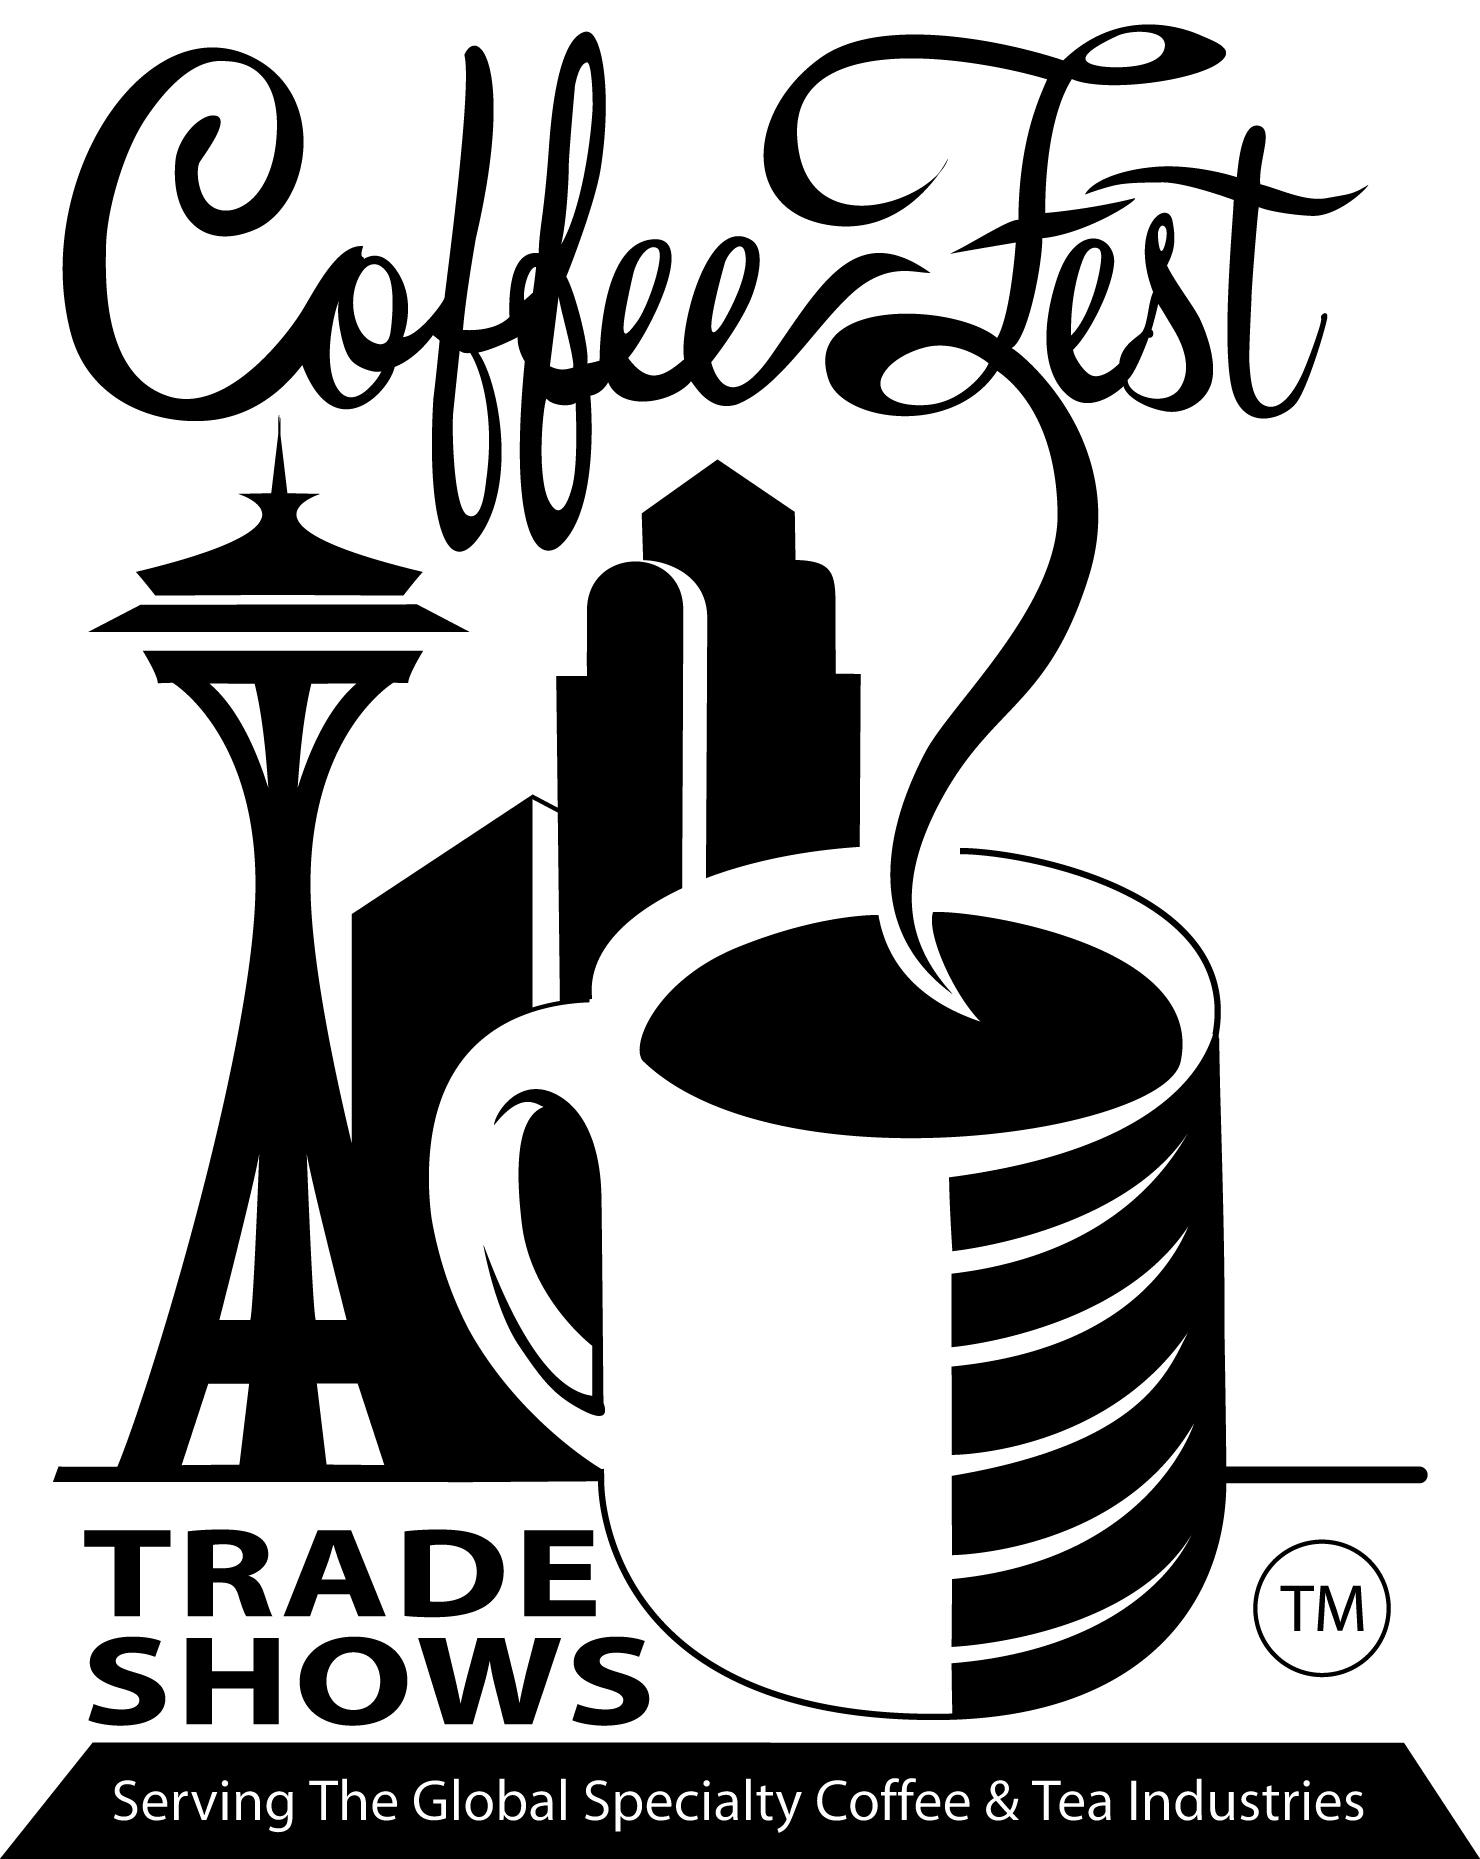 Festival clipart international trade Fest Trade Events Chicago Shows